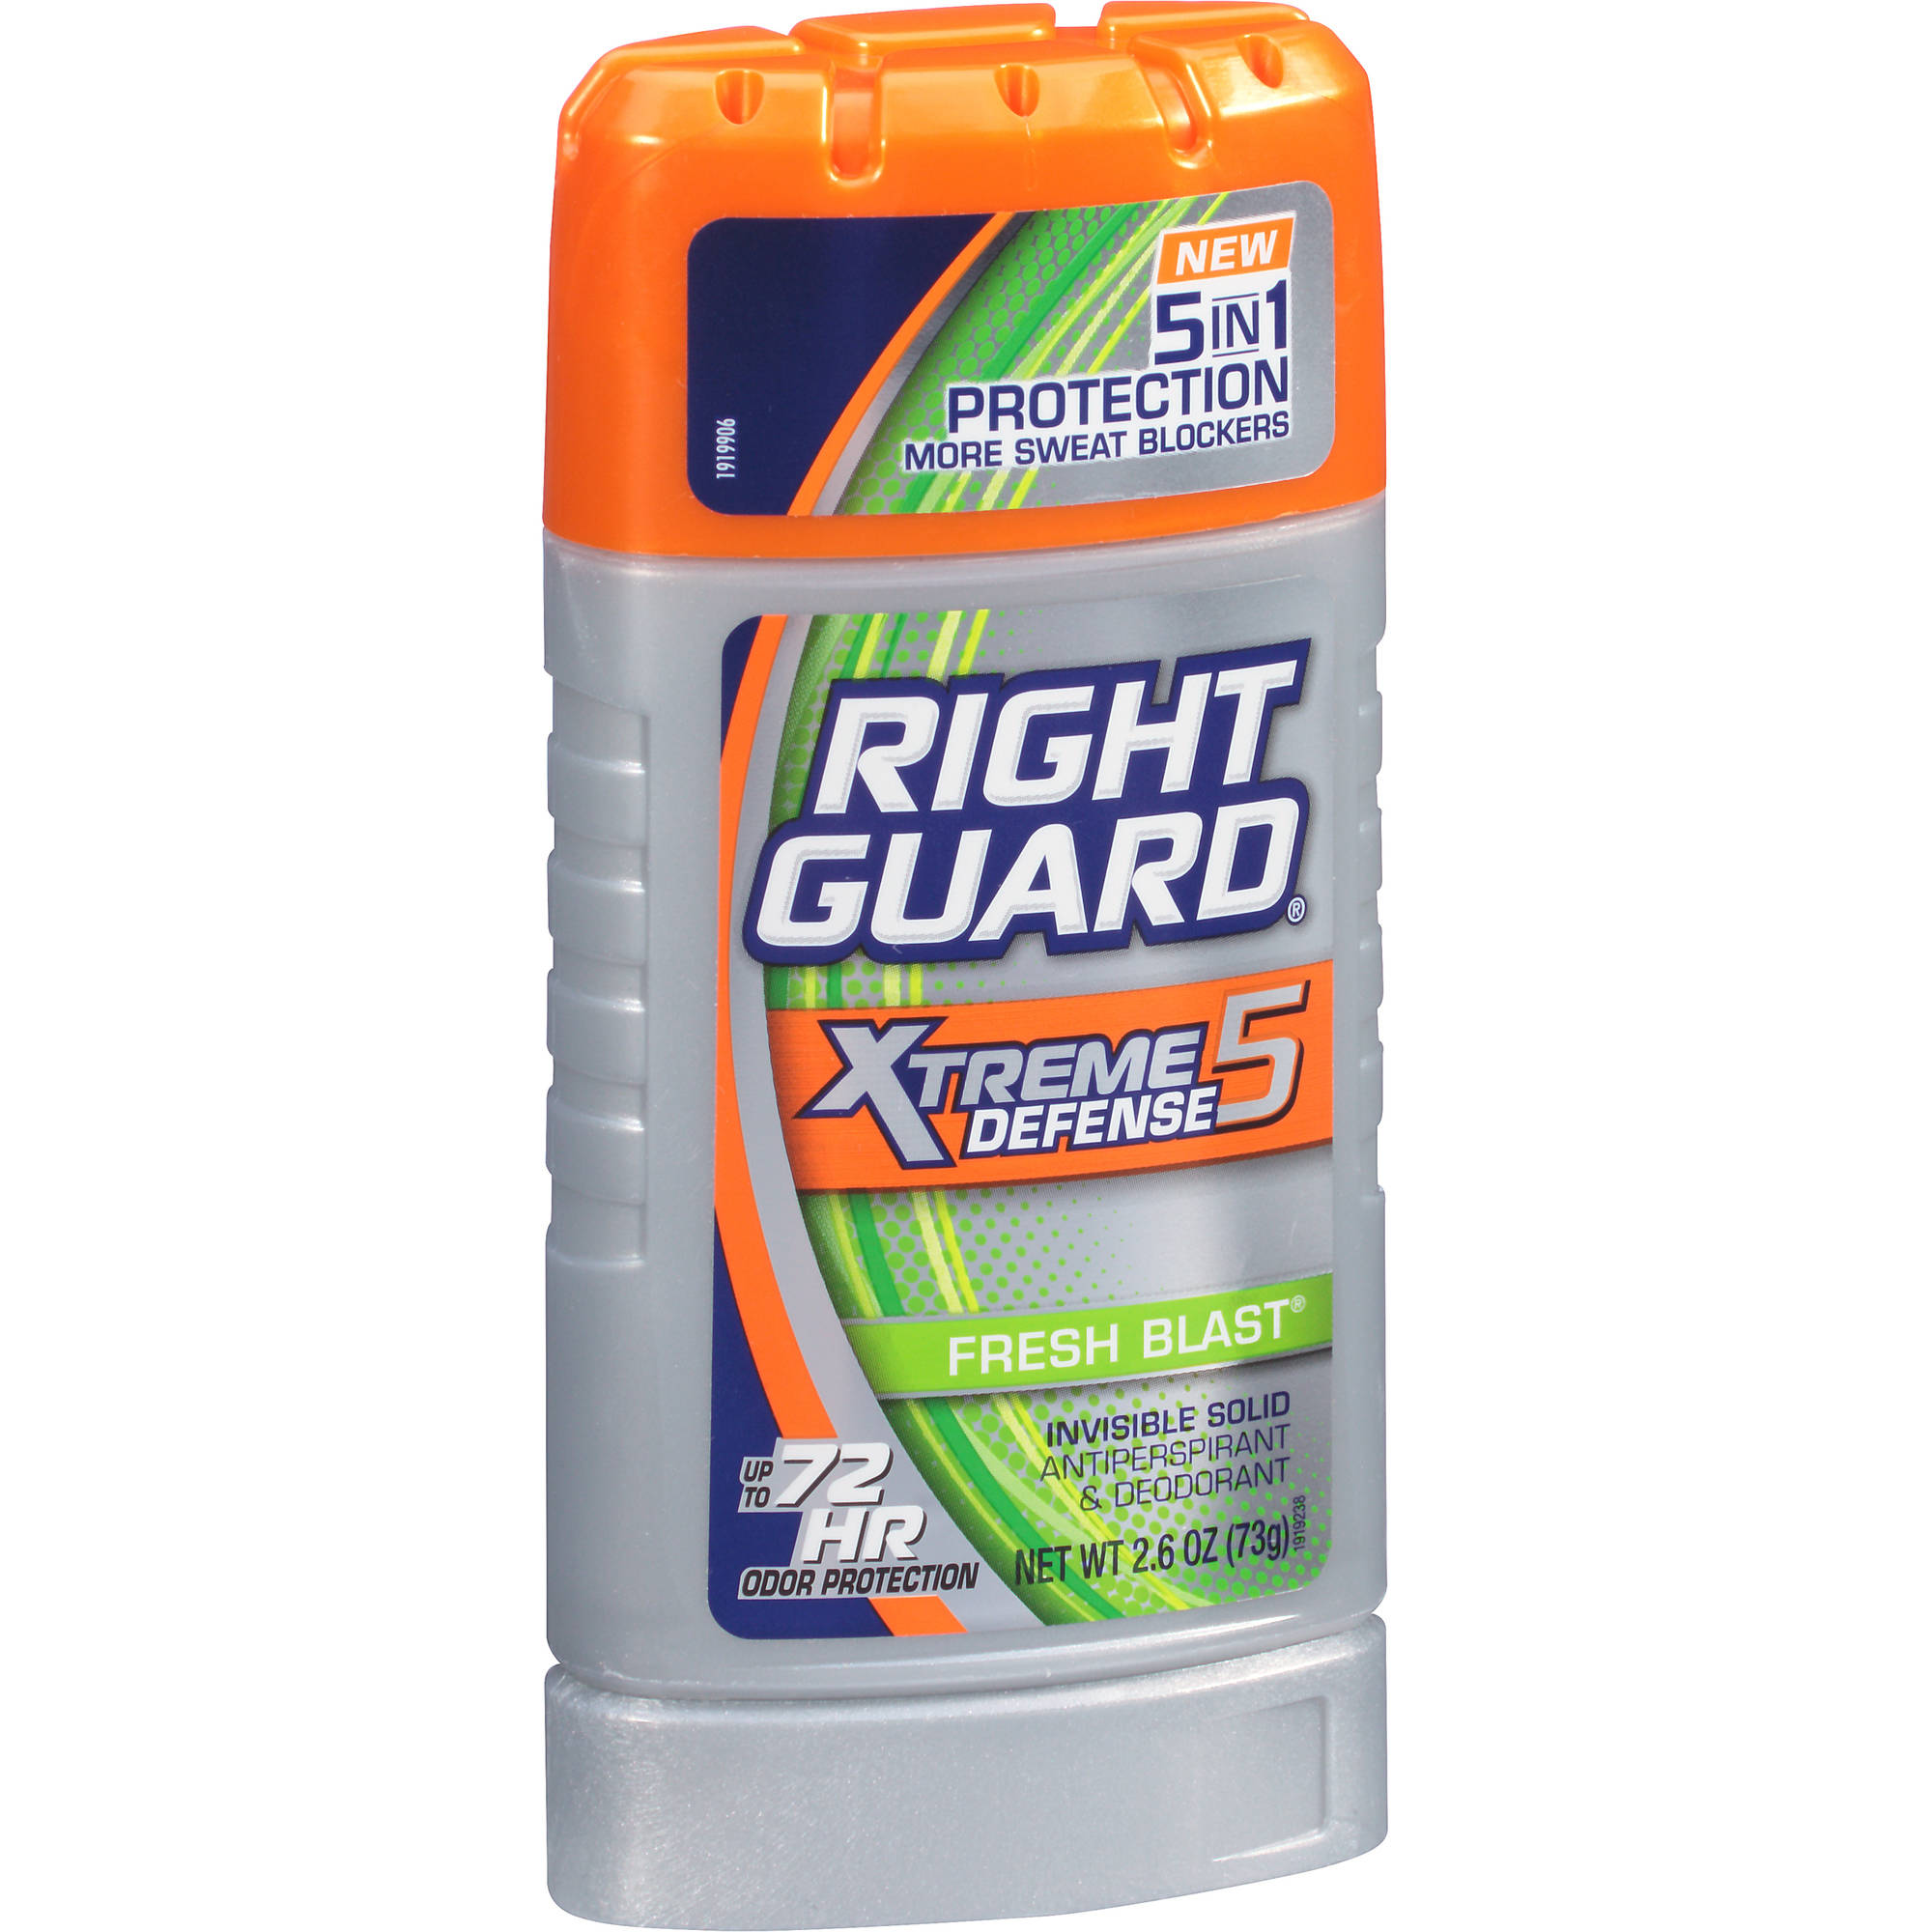 Right Guard Xtreme Defense 5 Antiperspirant Deodorant Invisible Solid Stick, Fresh Blast, 2.6 Oz